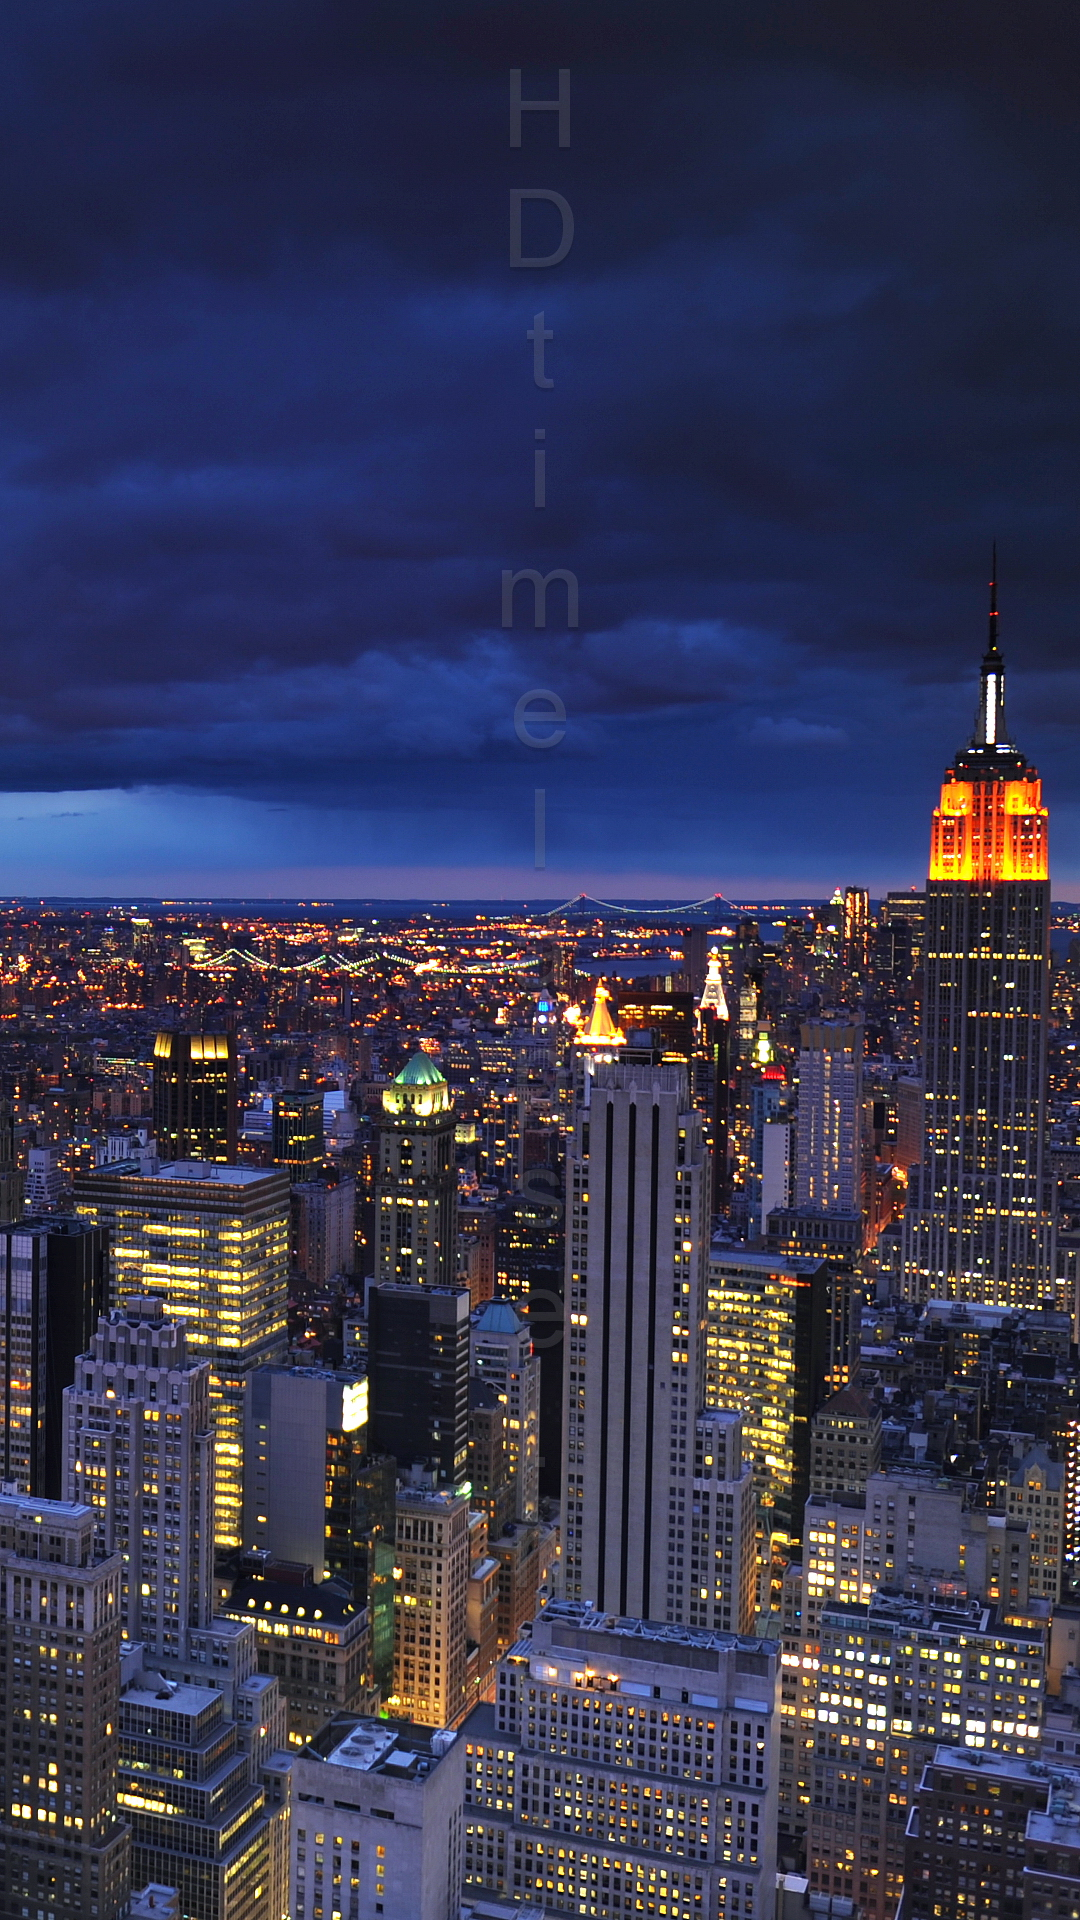 Free Download 4k Ultra Hd Wallpaper New York City 1080x1920